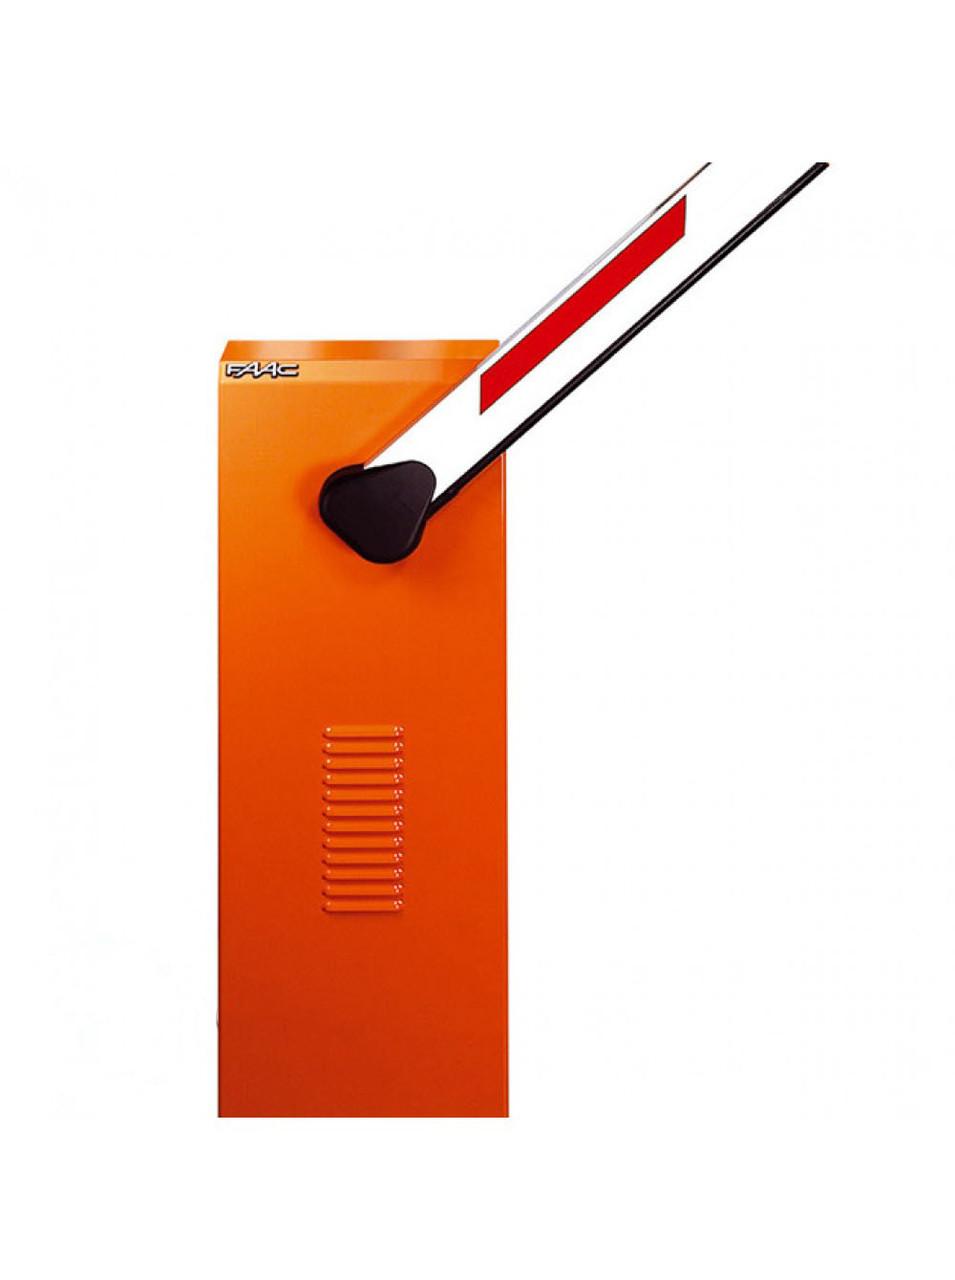 FAAC 620 Standard, стрела 4.815 м